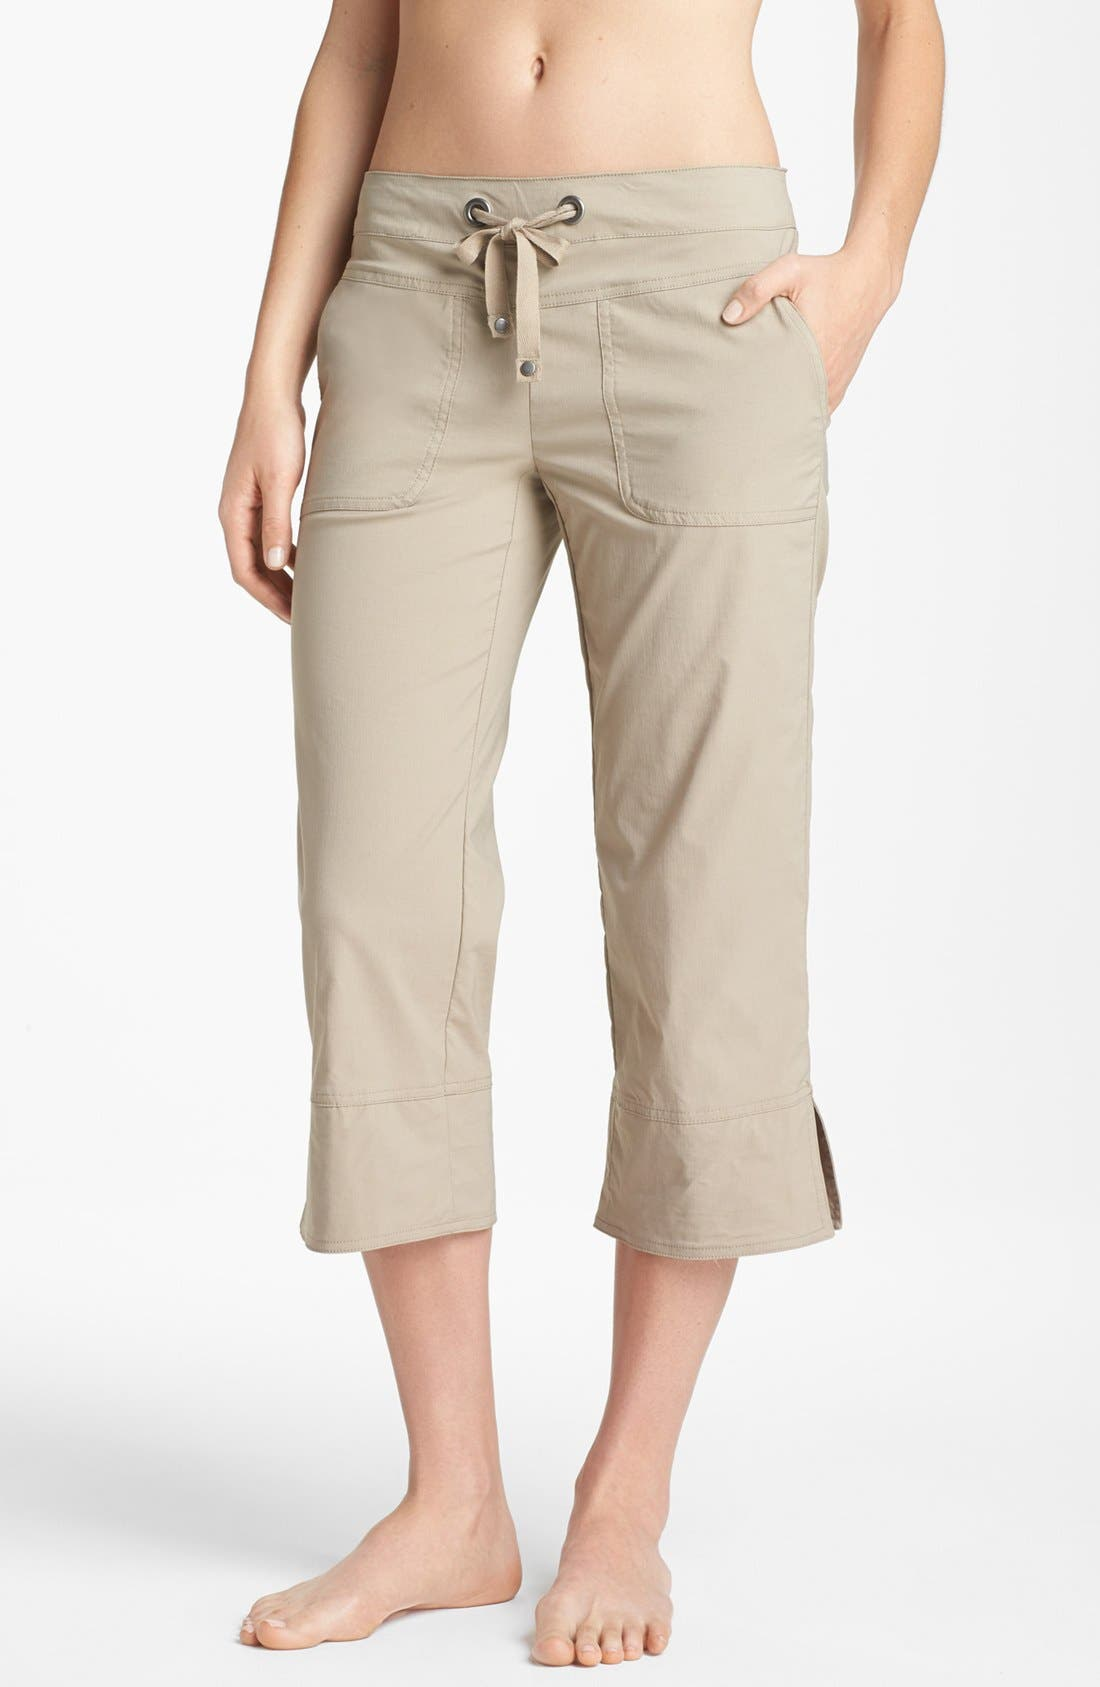 Alternate Image 1 Selected - prAna 'Bliss' Capri Pants